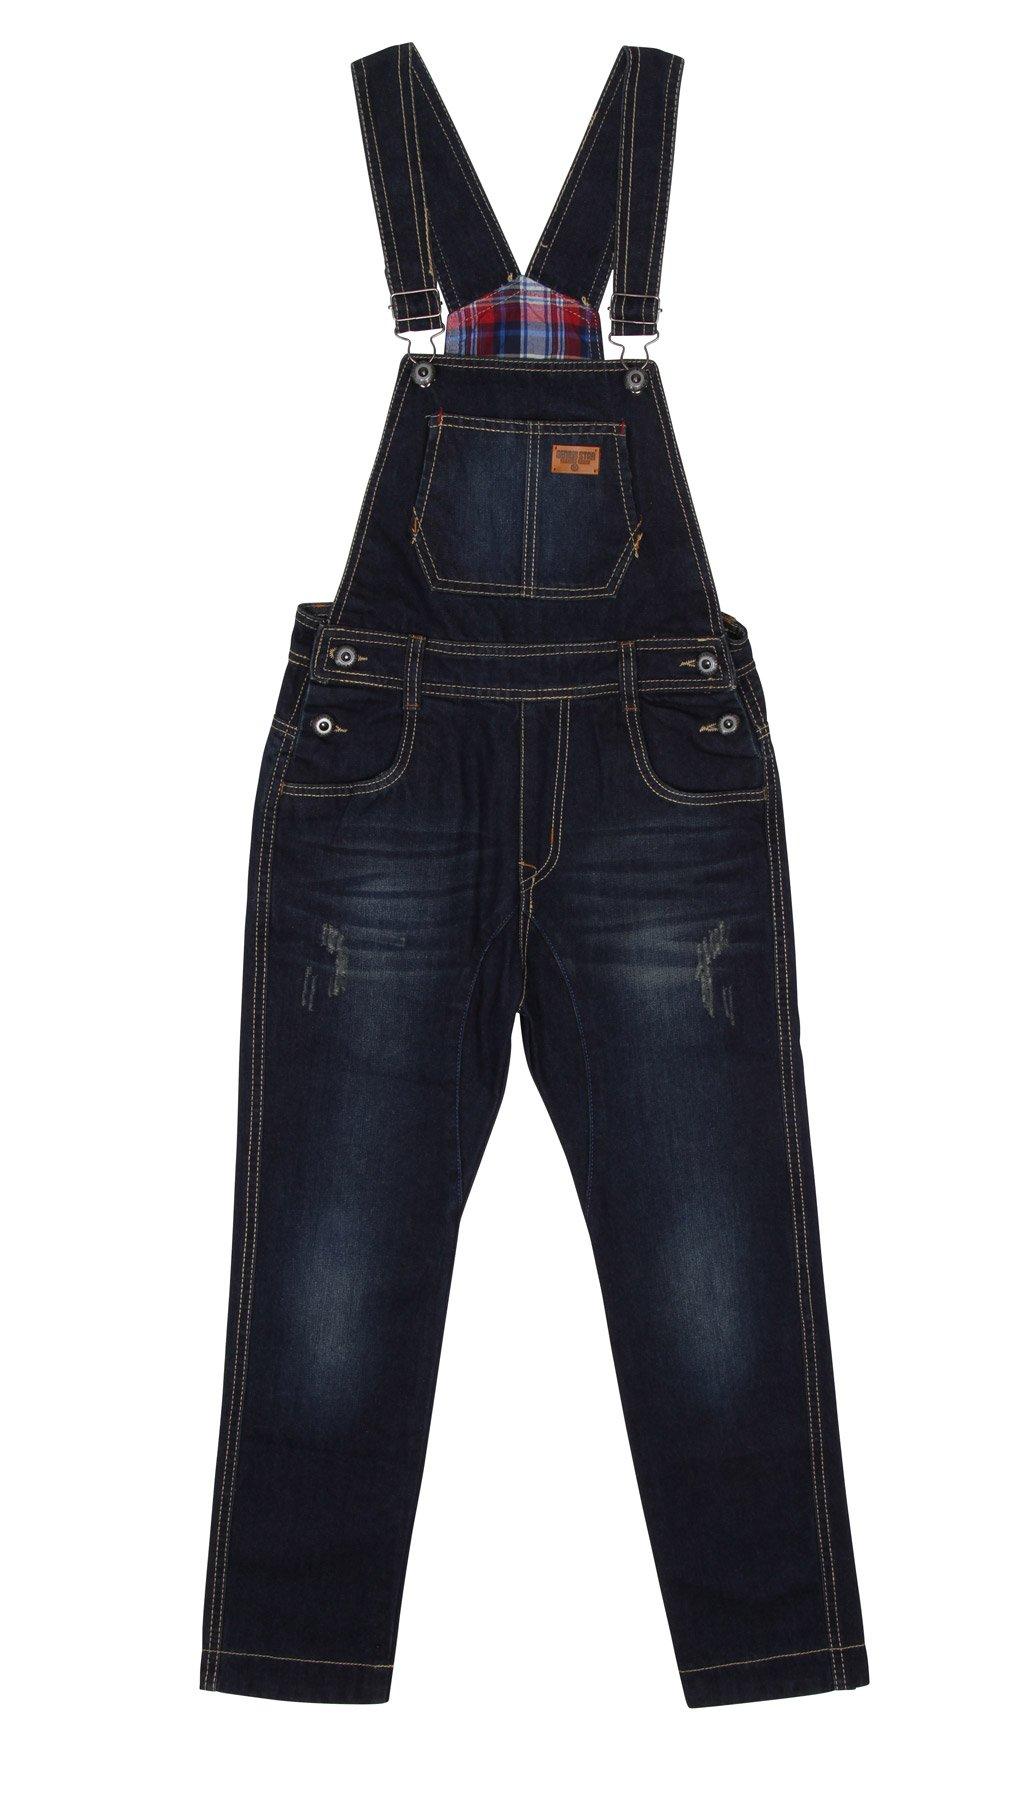 Big Boys' Darkwash Denim Bib Overalls Boys Blue Slim leg pants , 10 Years , Blue